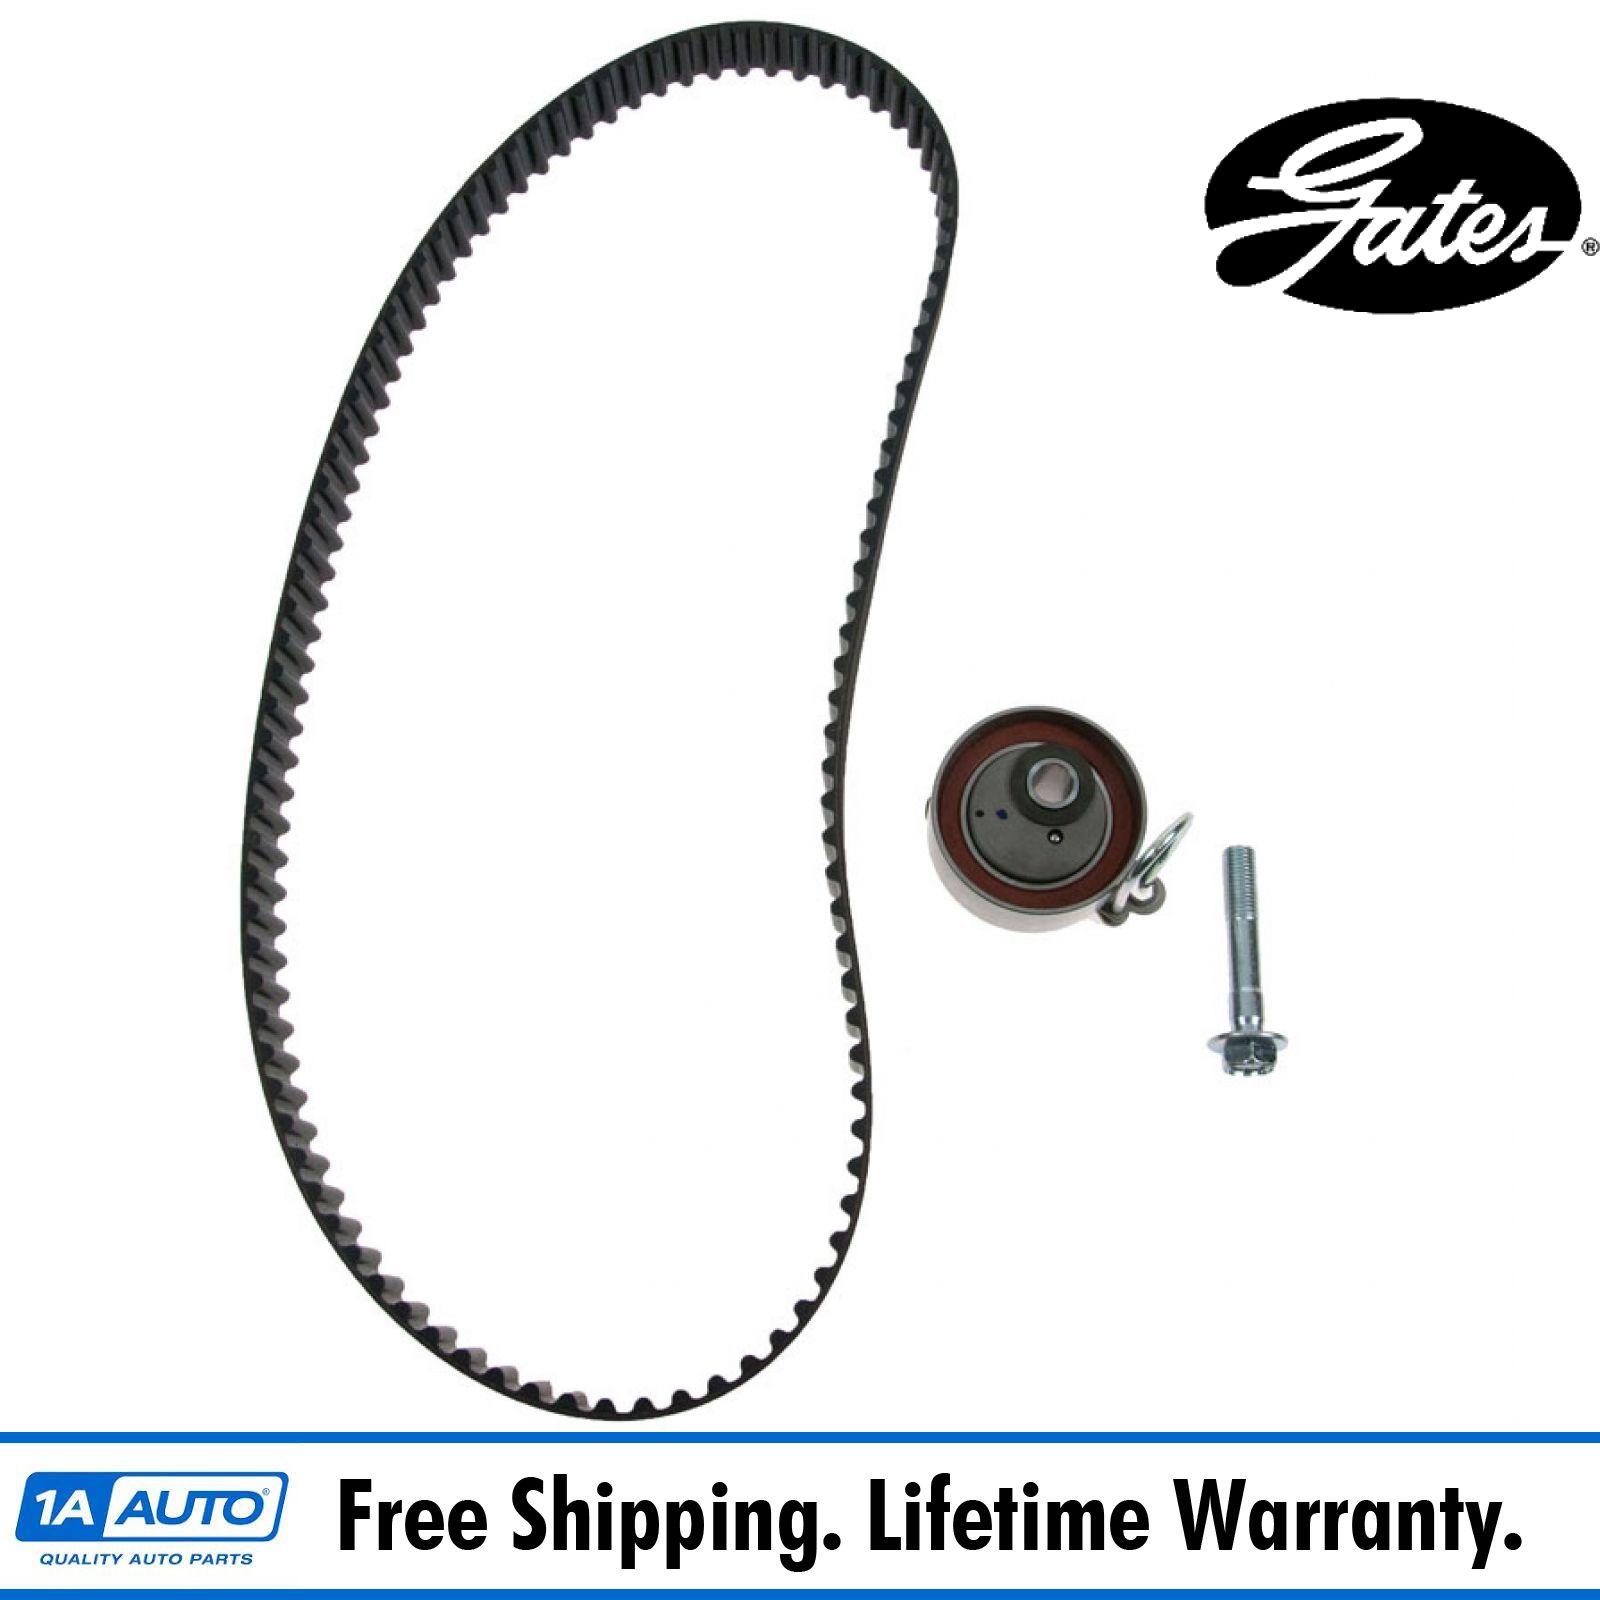 GATES TCK312 Timing Belt & Tensioner Kit For Acura EL Honda Civic 1.7L